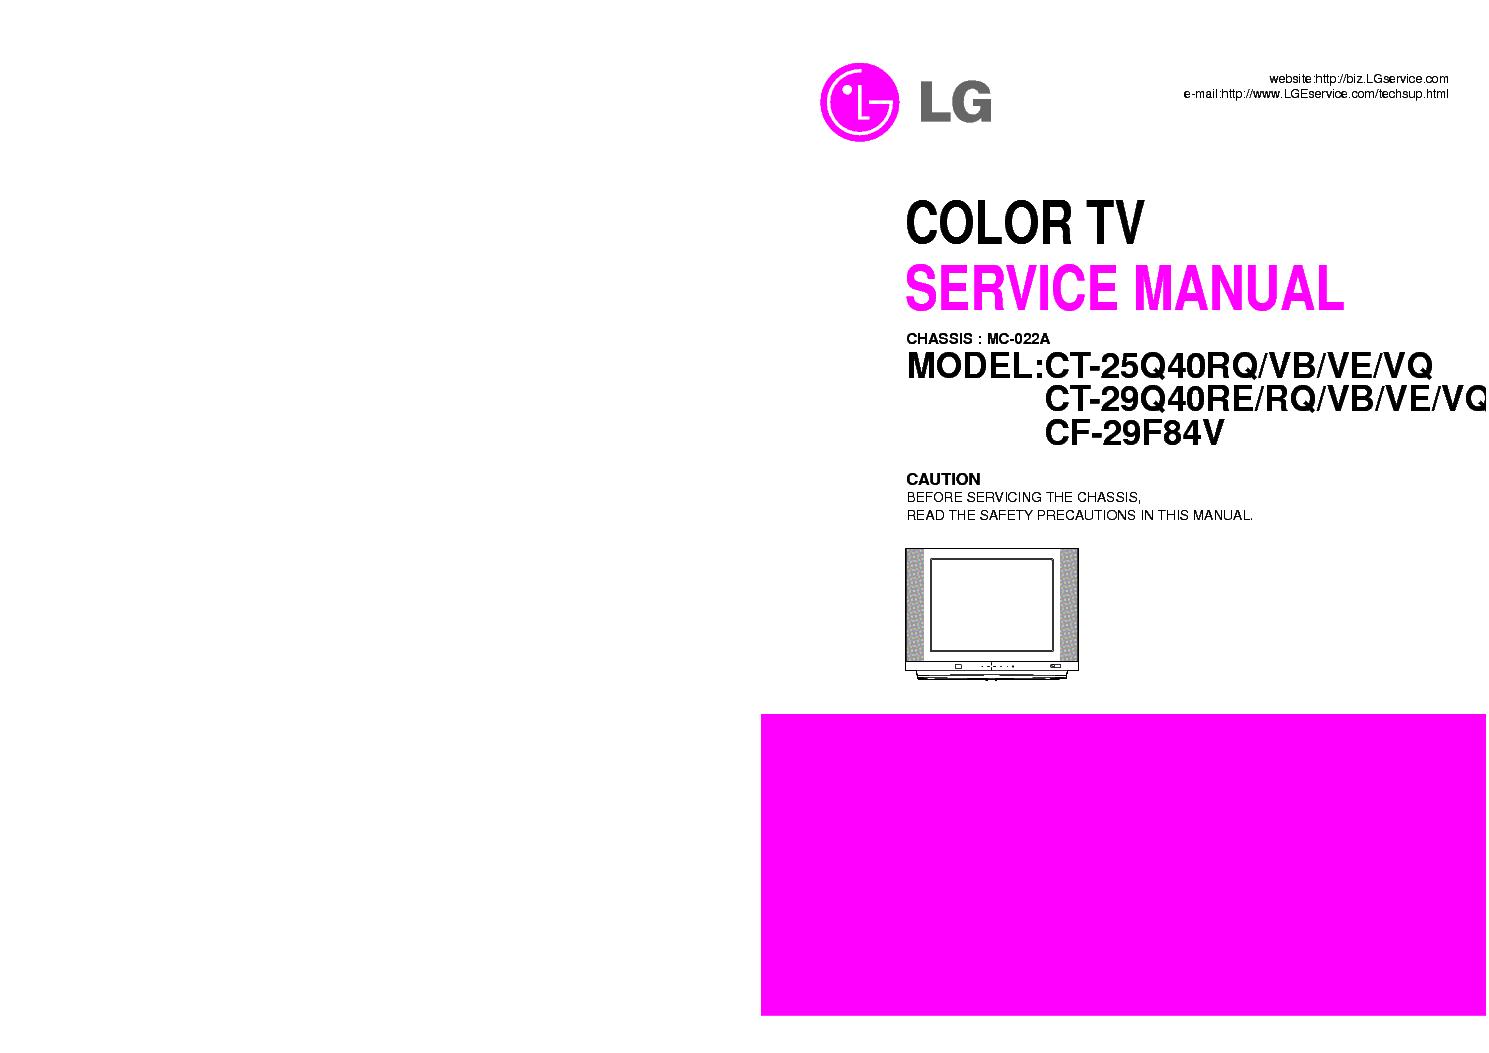 iphone 5 instruction manual pdf